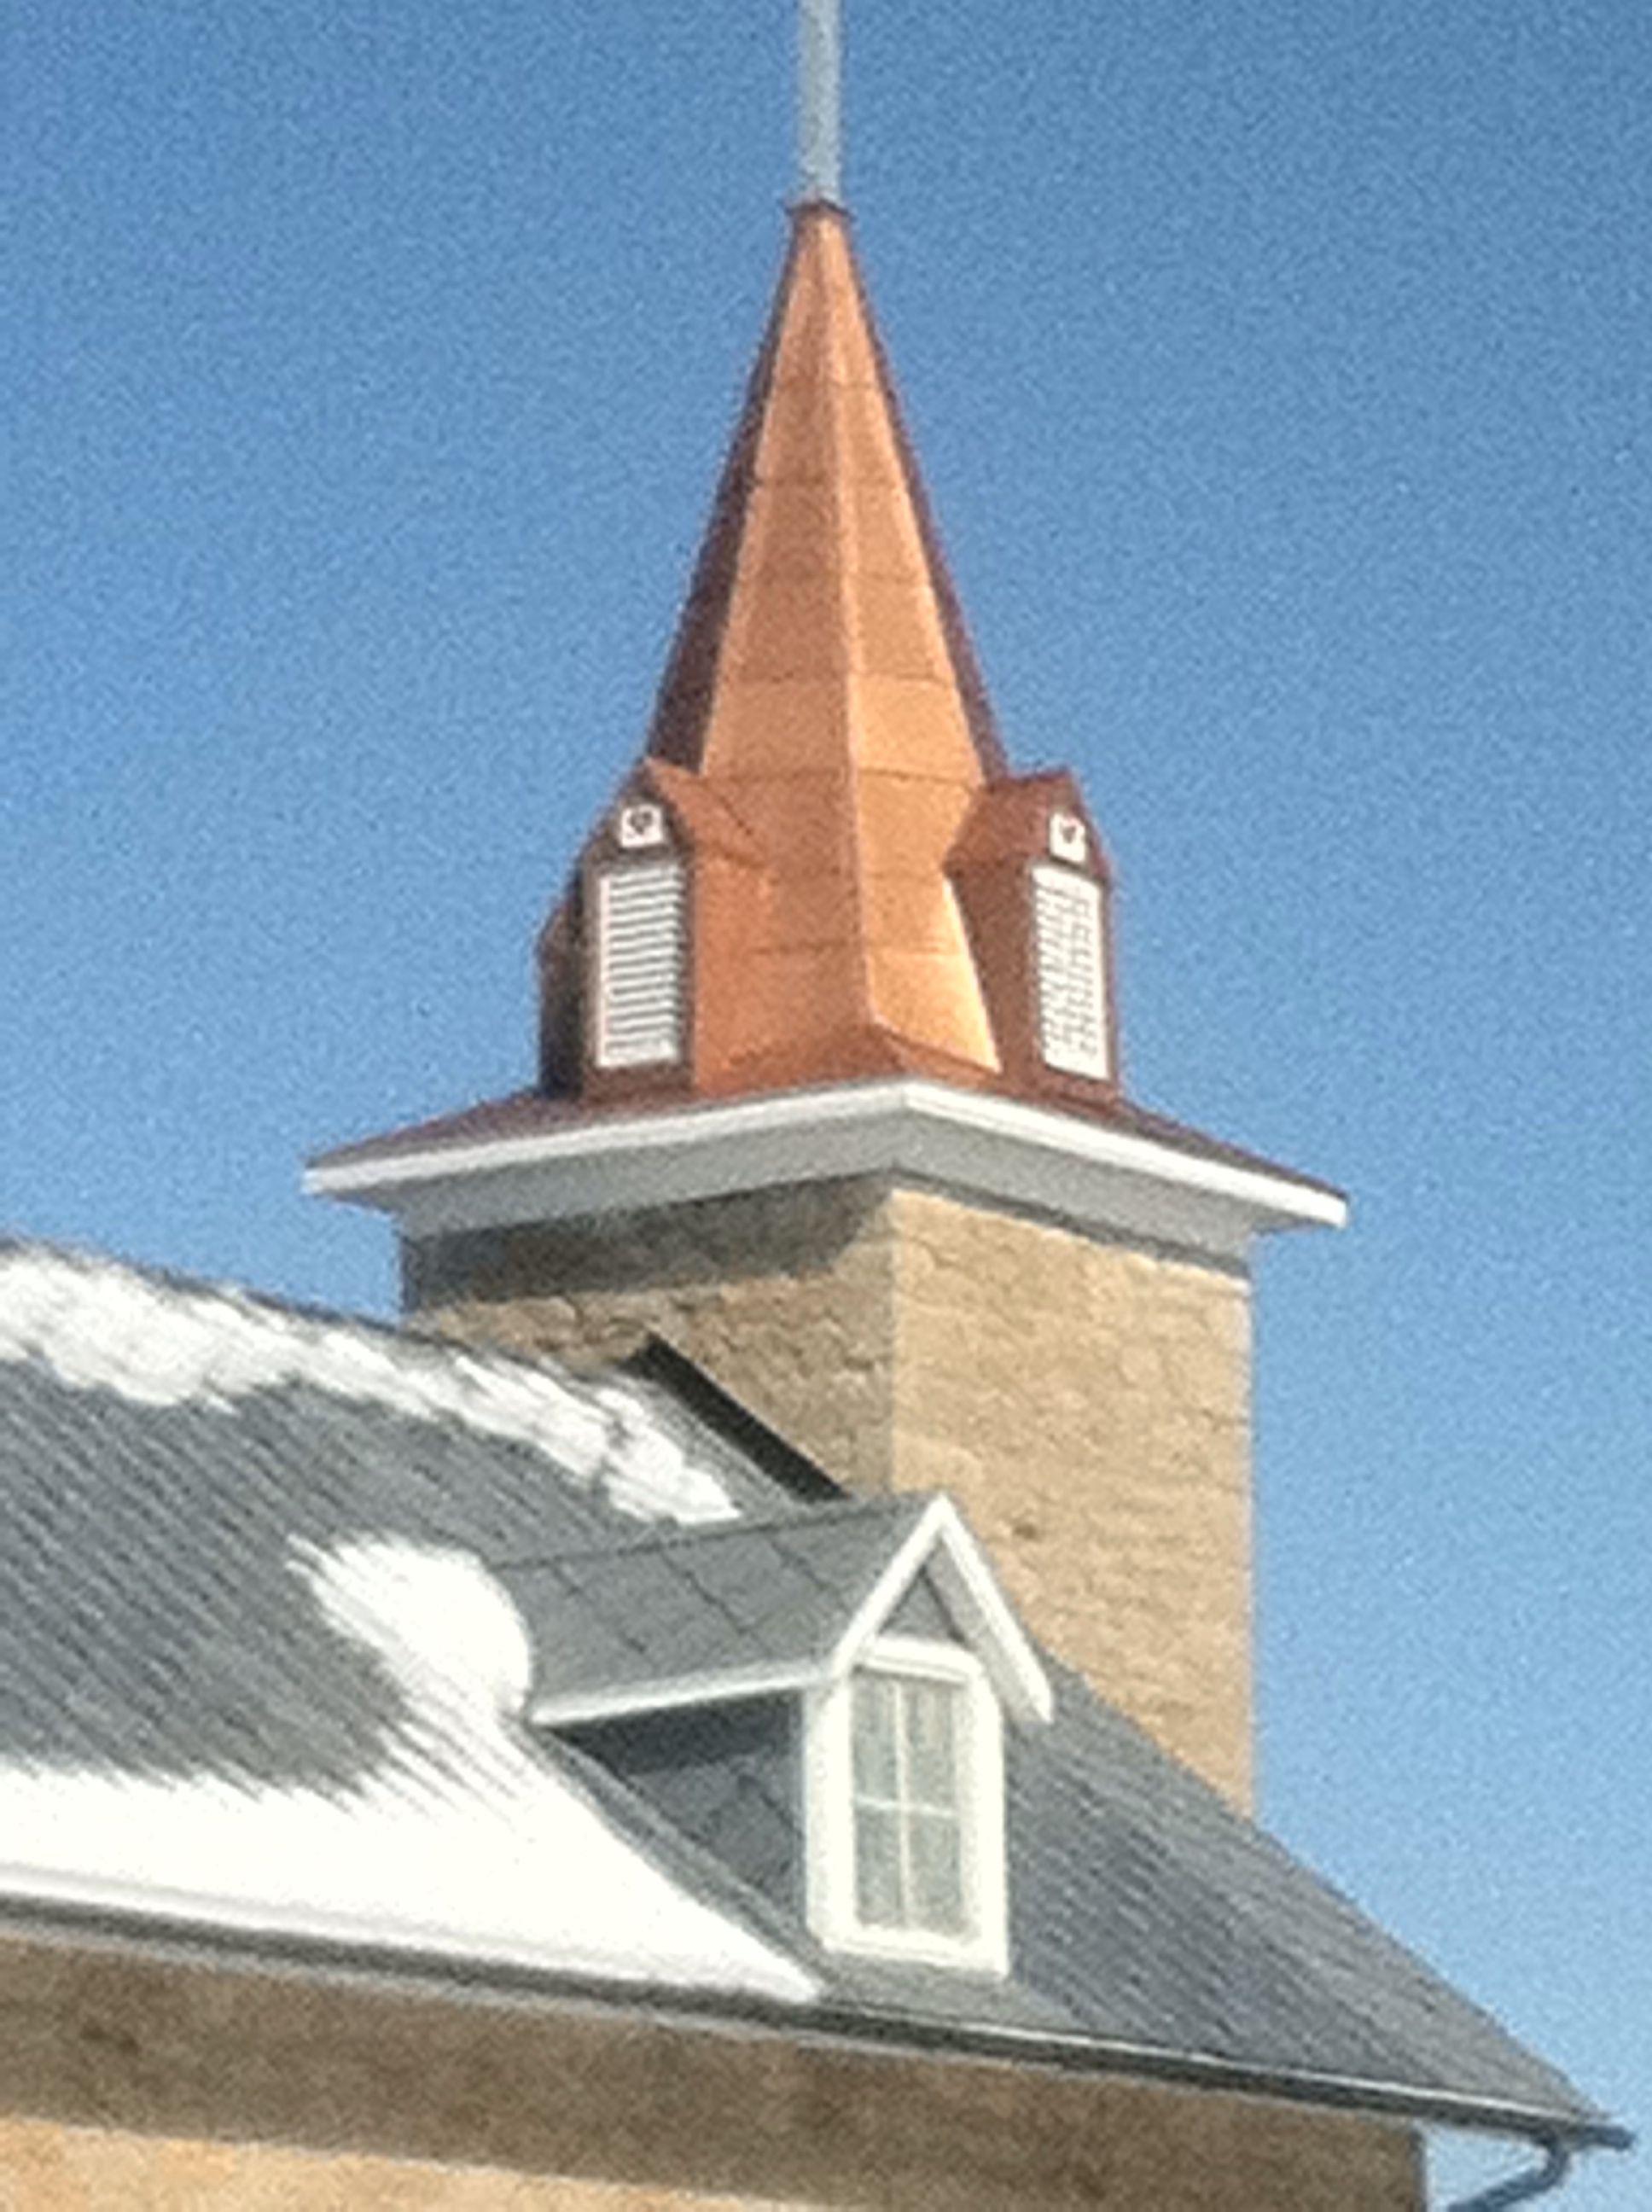 Copper church steeple